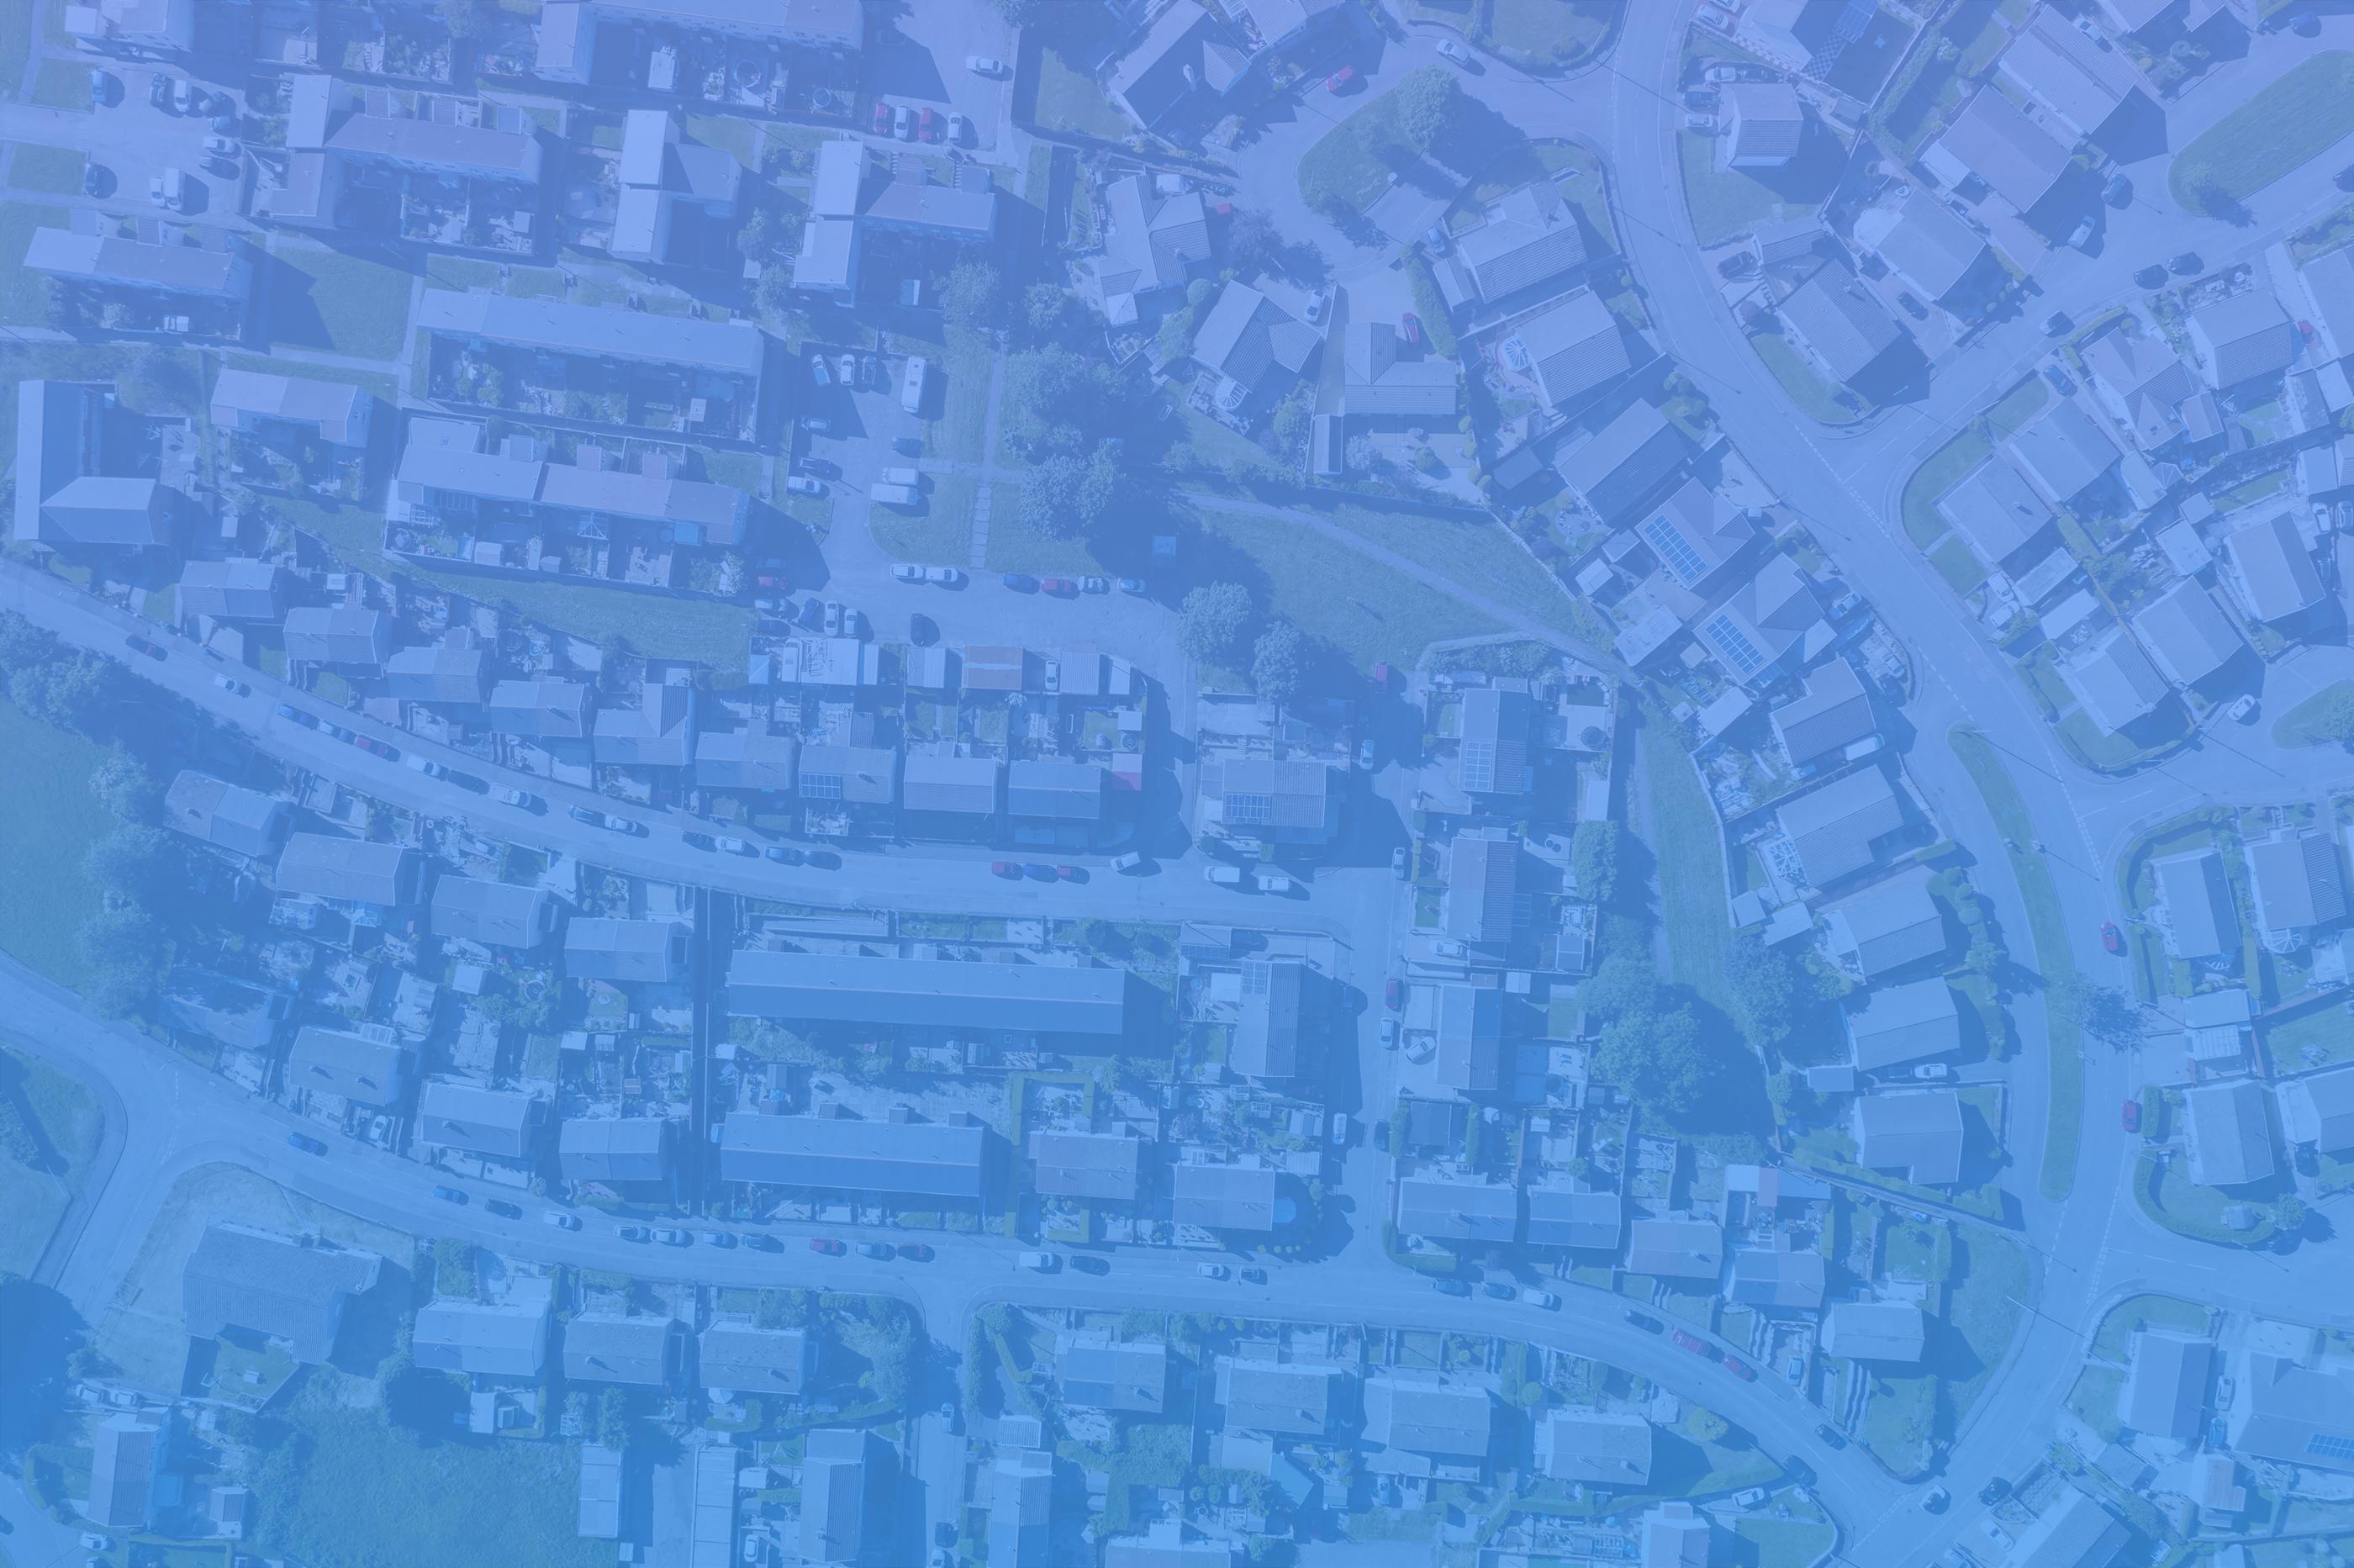 real estate leads birds eye view neighborhood blue ovrly-1